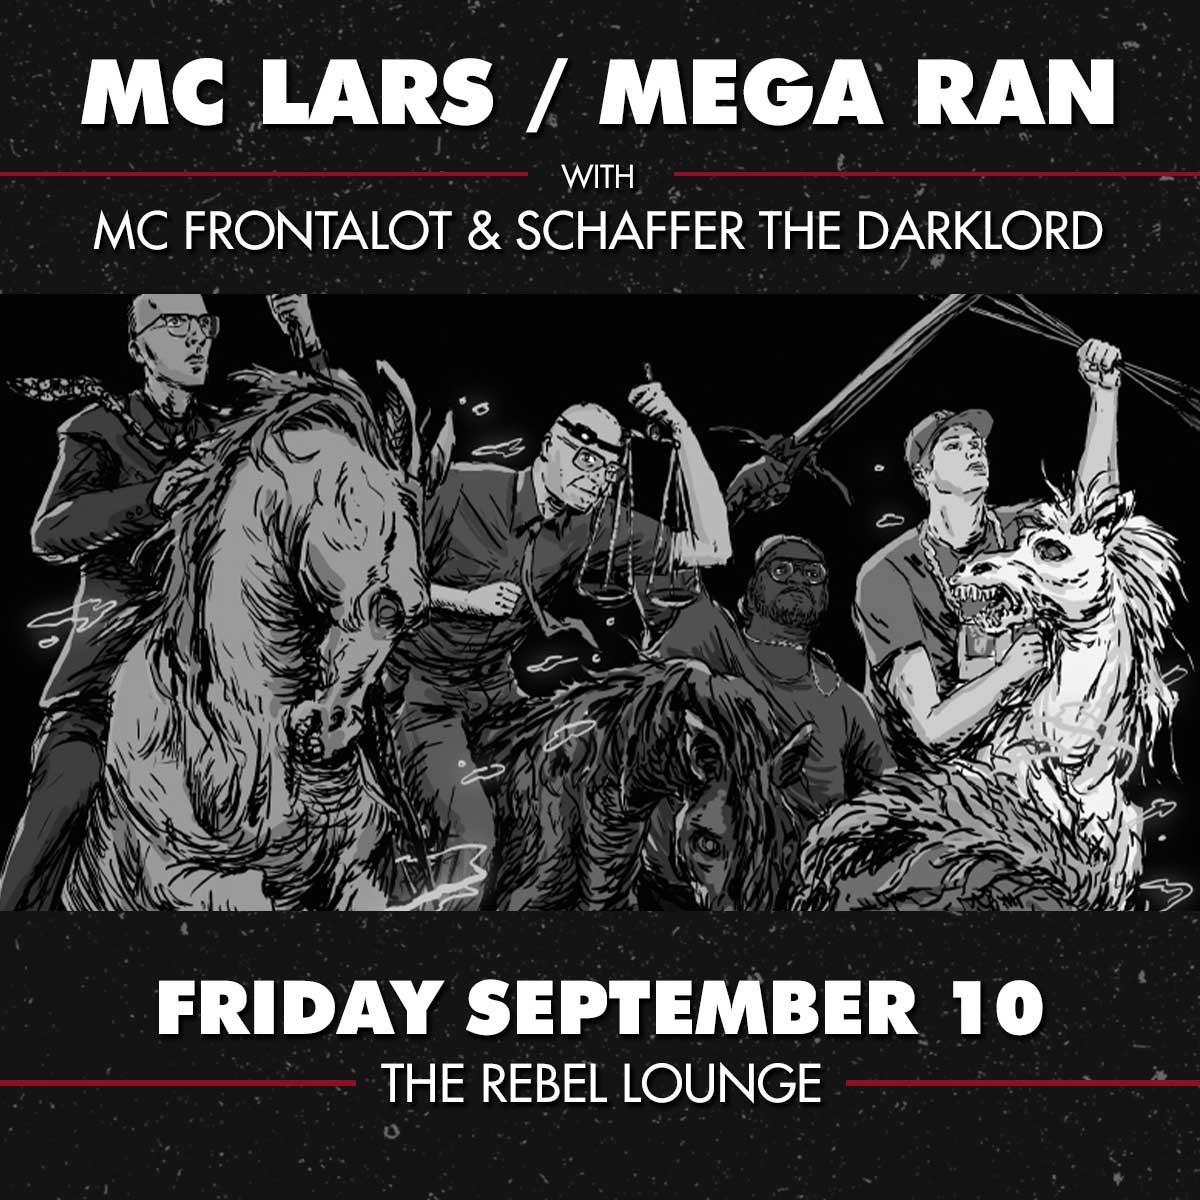 MC LARS, MEGA RAN, MC FRONTALOT & SCHAFFER THE DARKLORD: